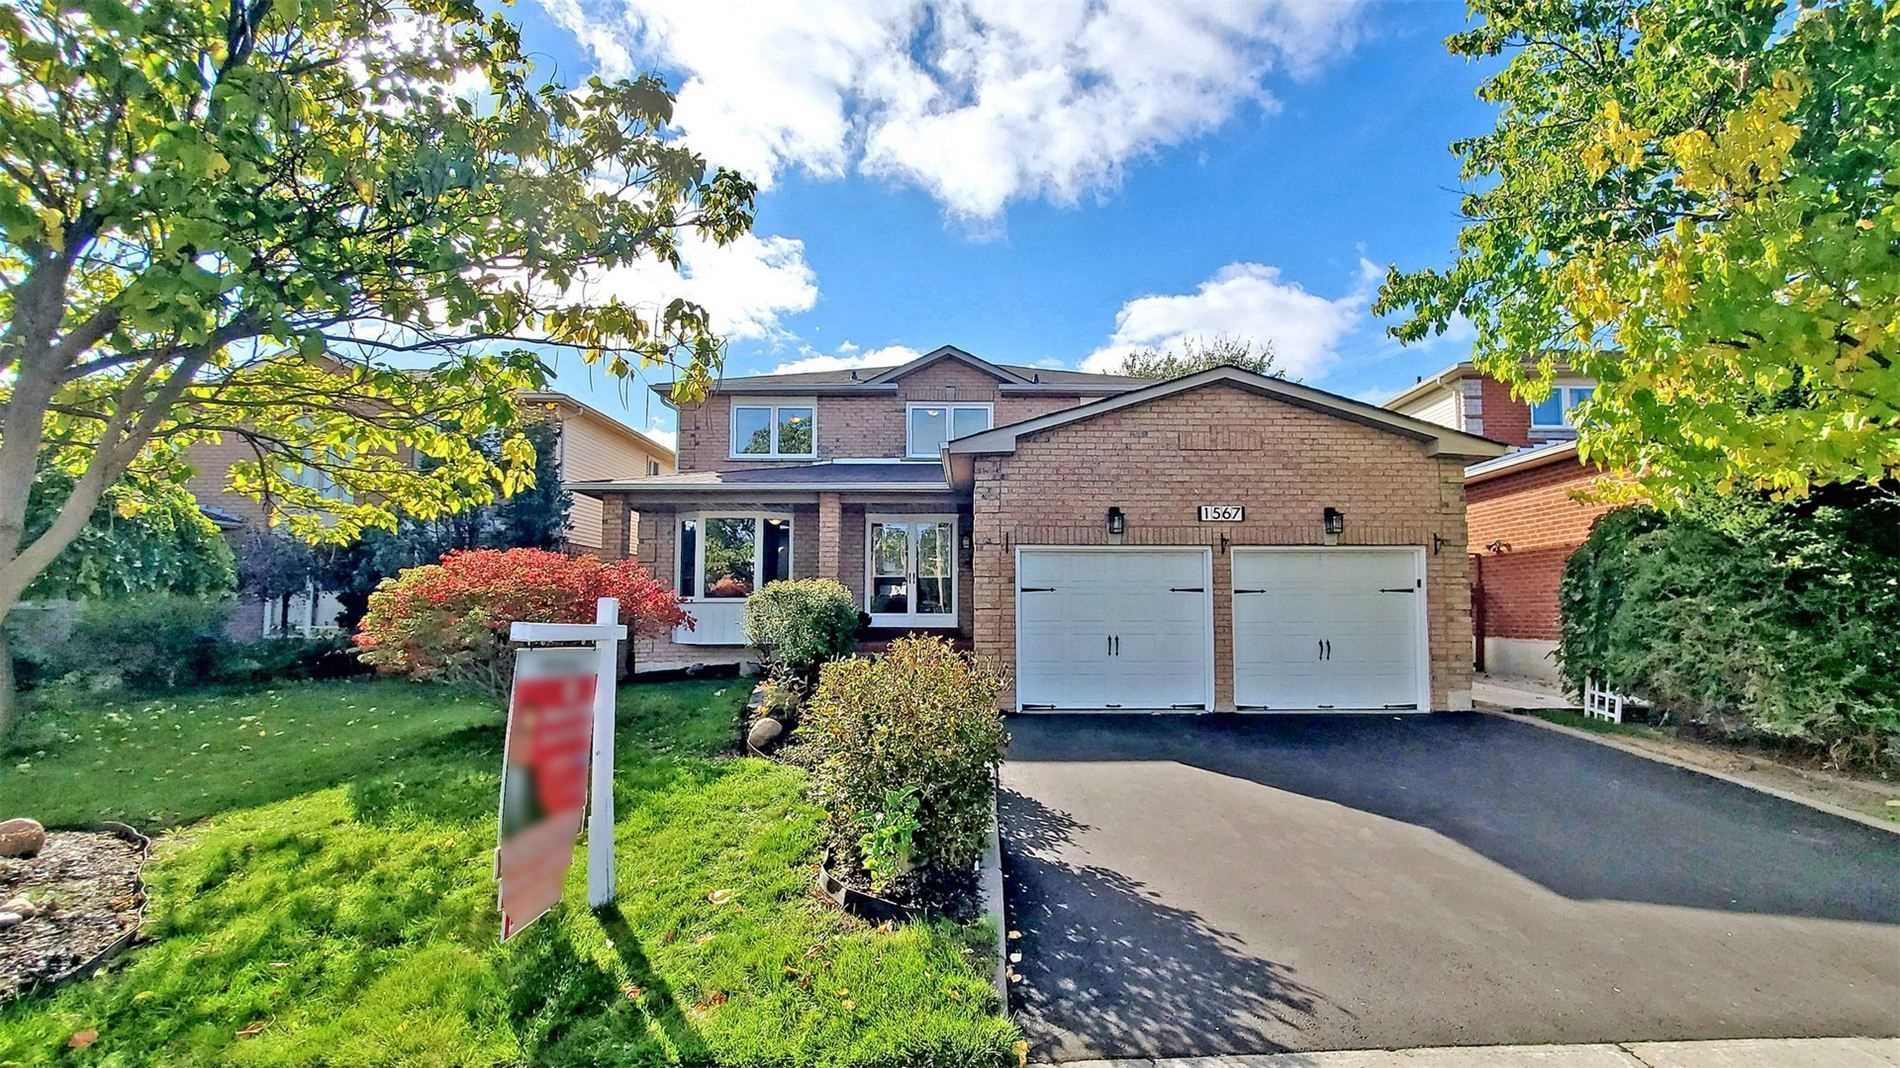 1567 Major Oaks Rd, Pickering, Ontario L1X2L1, 4 Bedrooms Bedrooms, ,4 BathroomsBathrooms,Detached,For Sale,Major Oaks,E5415547